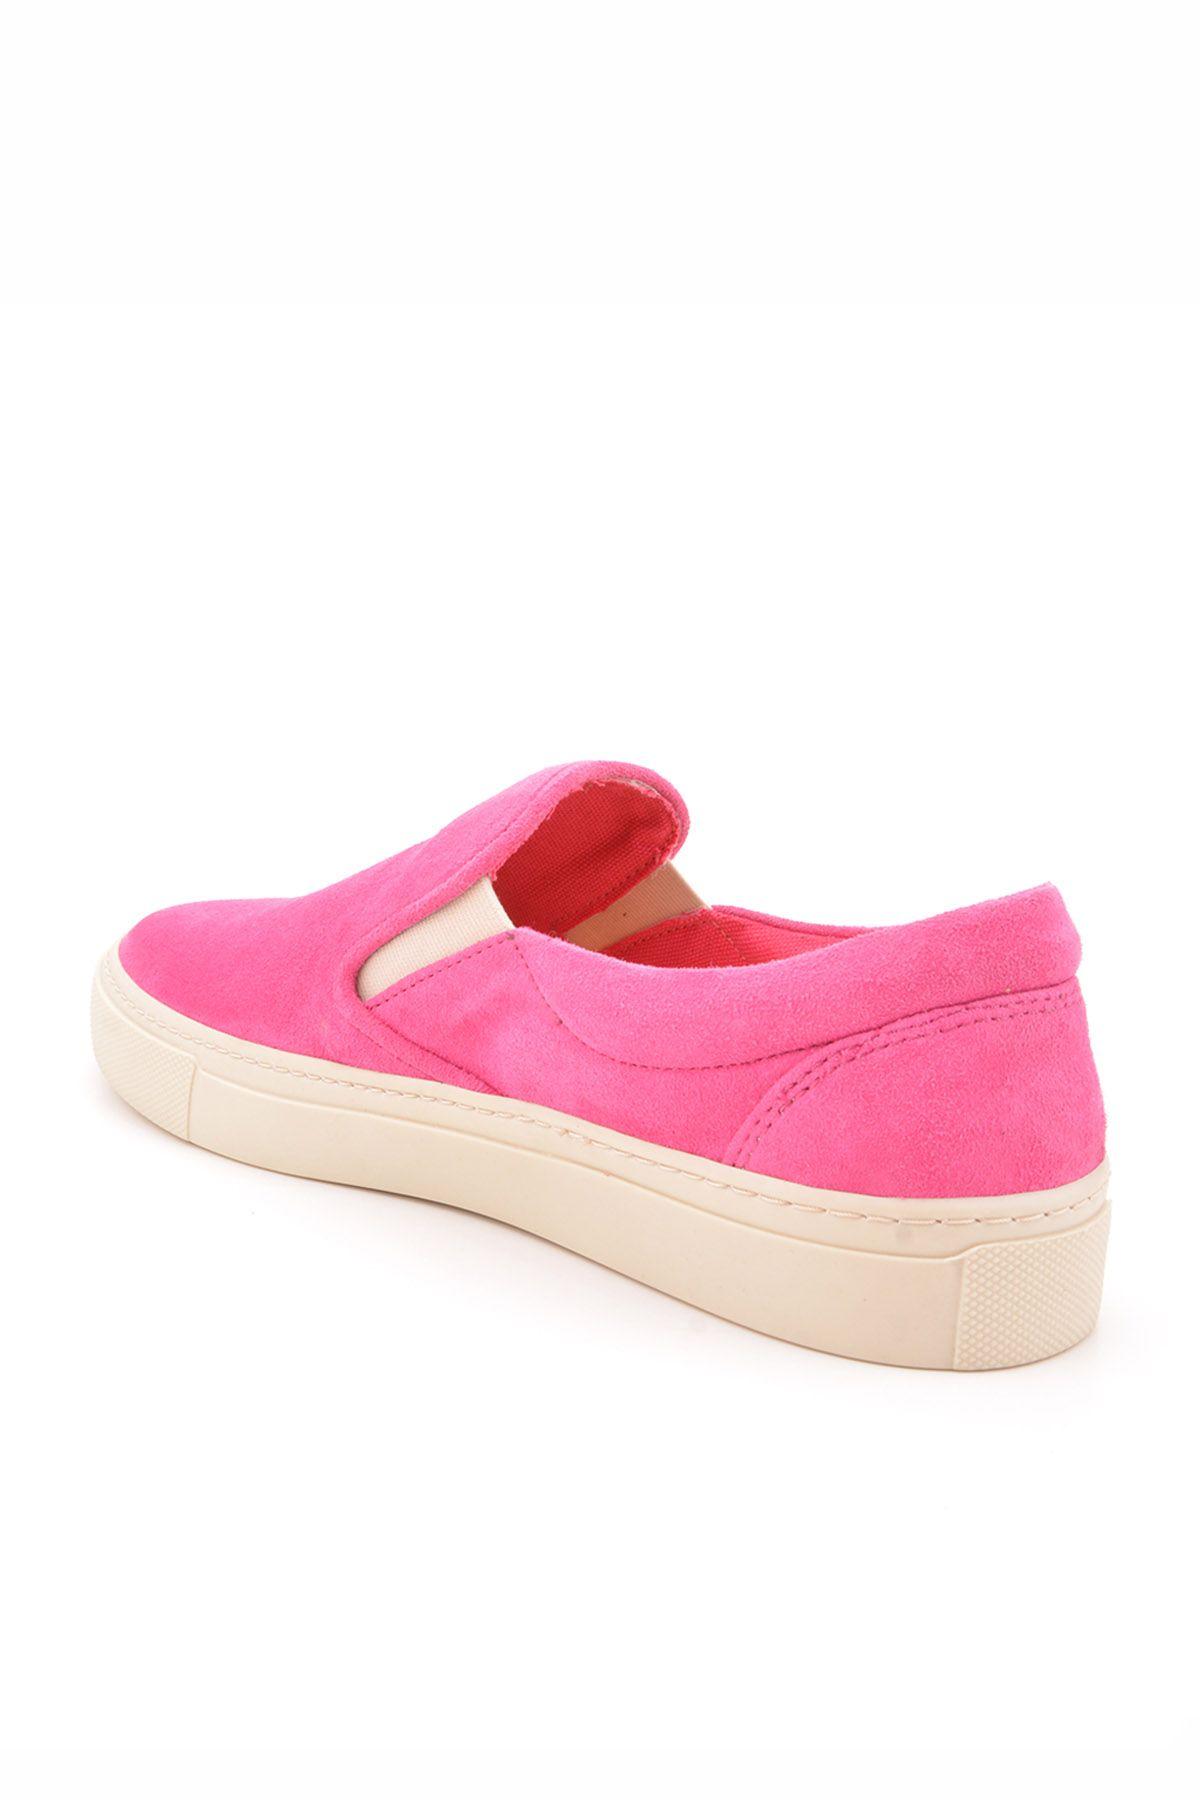 Art Goya Women Sneakers From Genuine Nubuck Pink